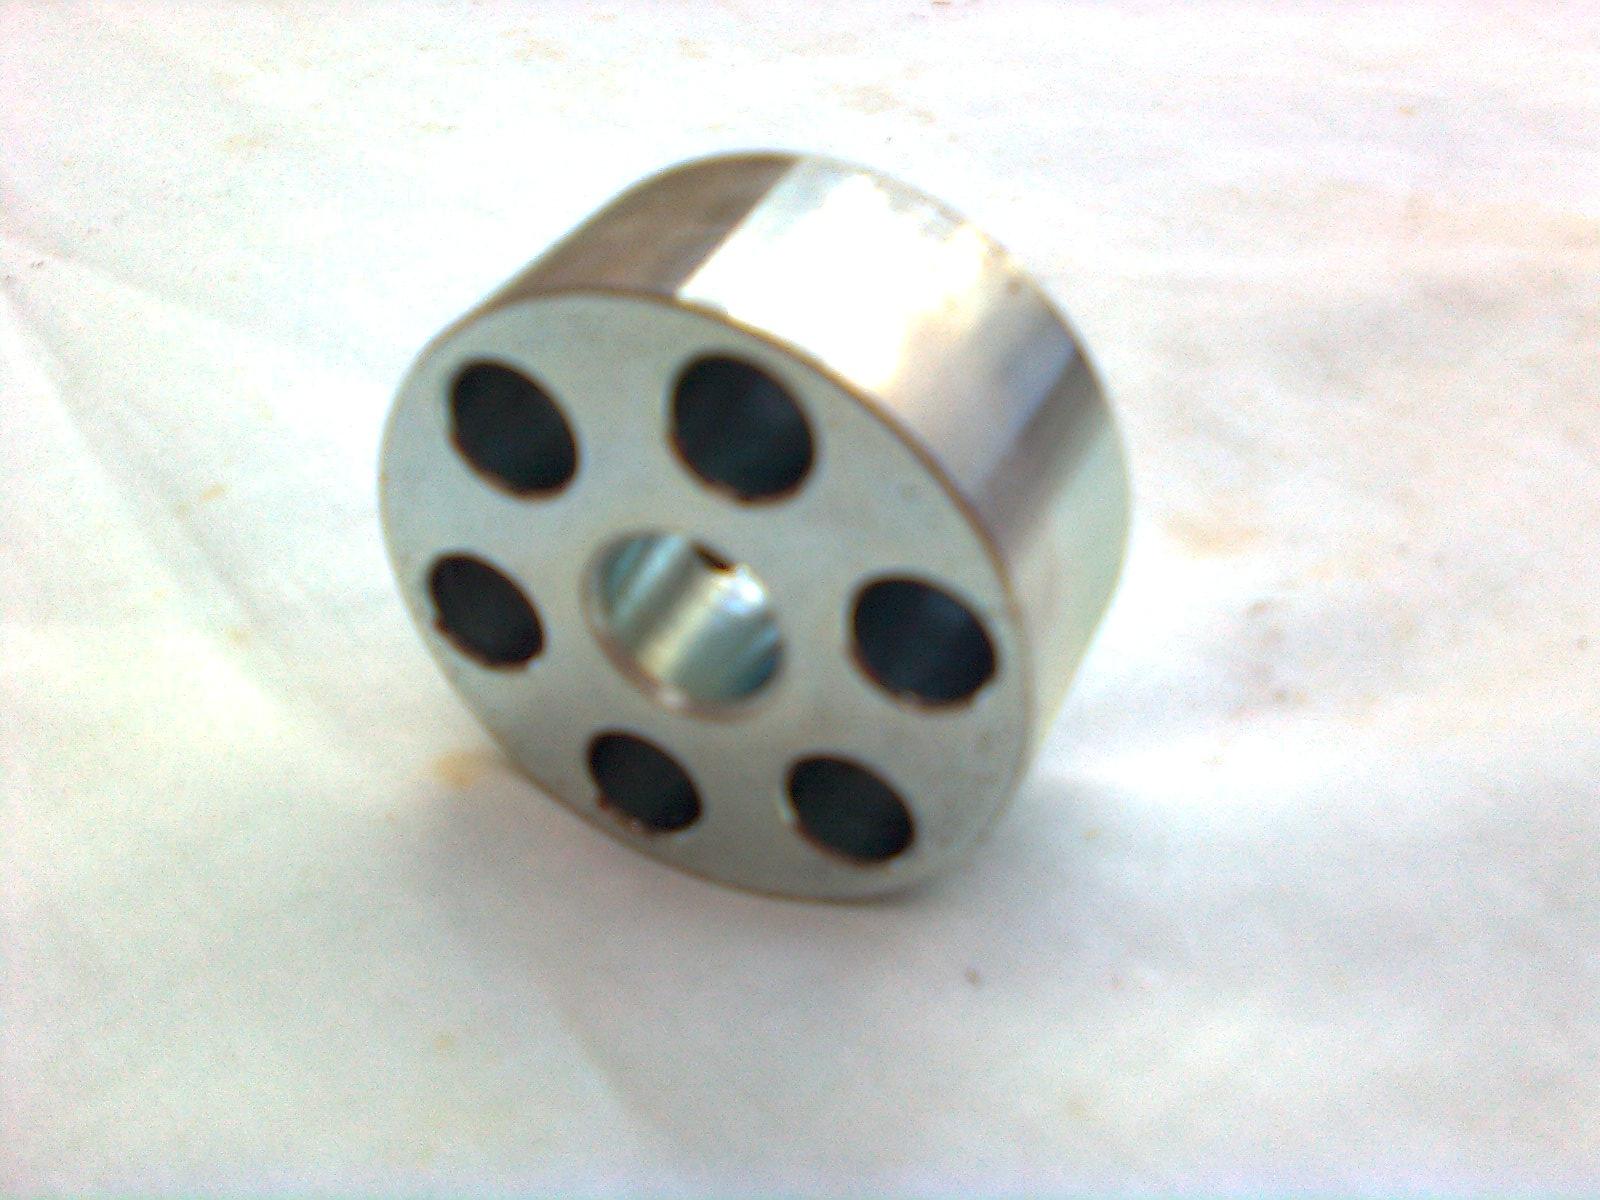 090206-611 : Coupling - metal - 11mm Bore Image